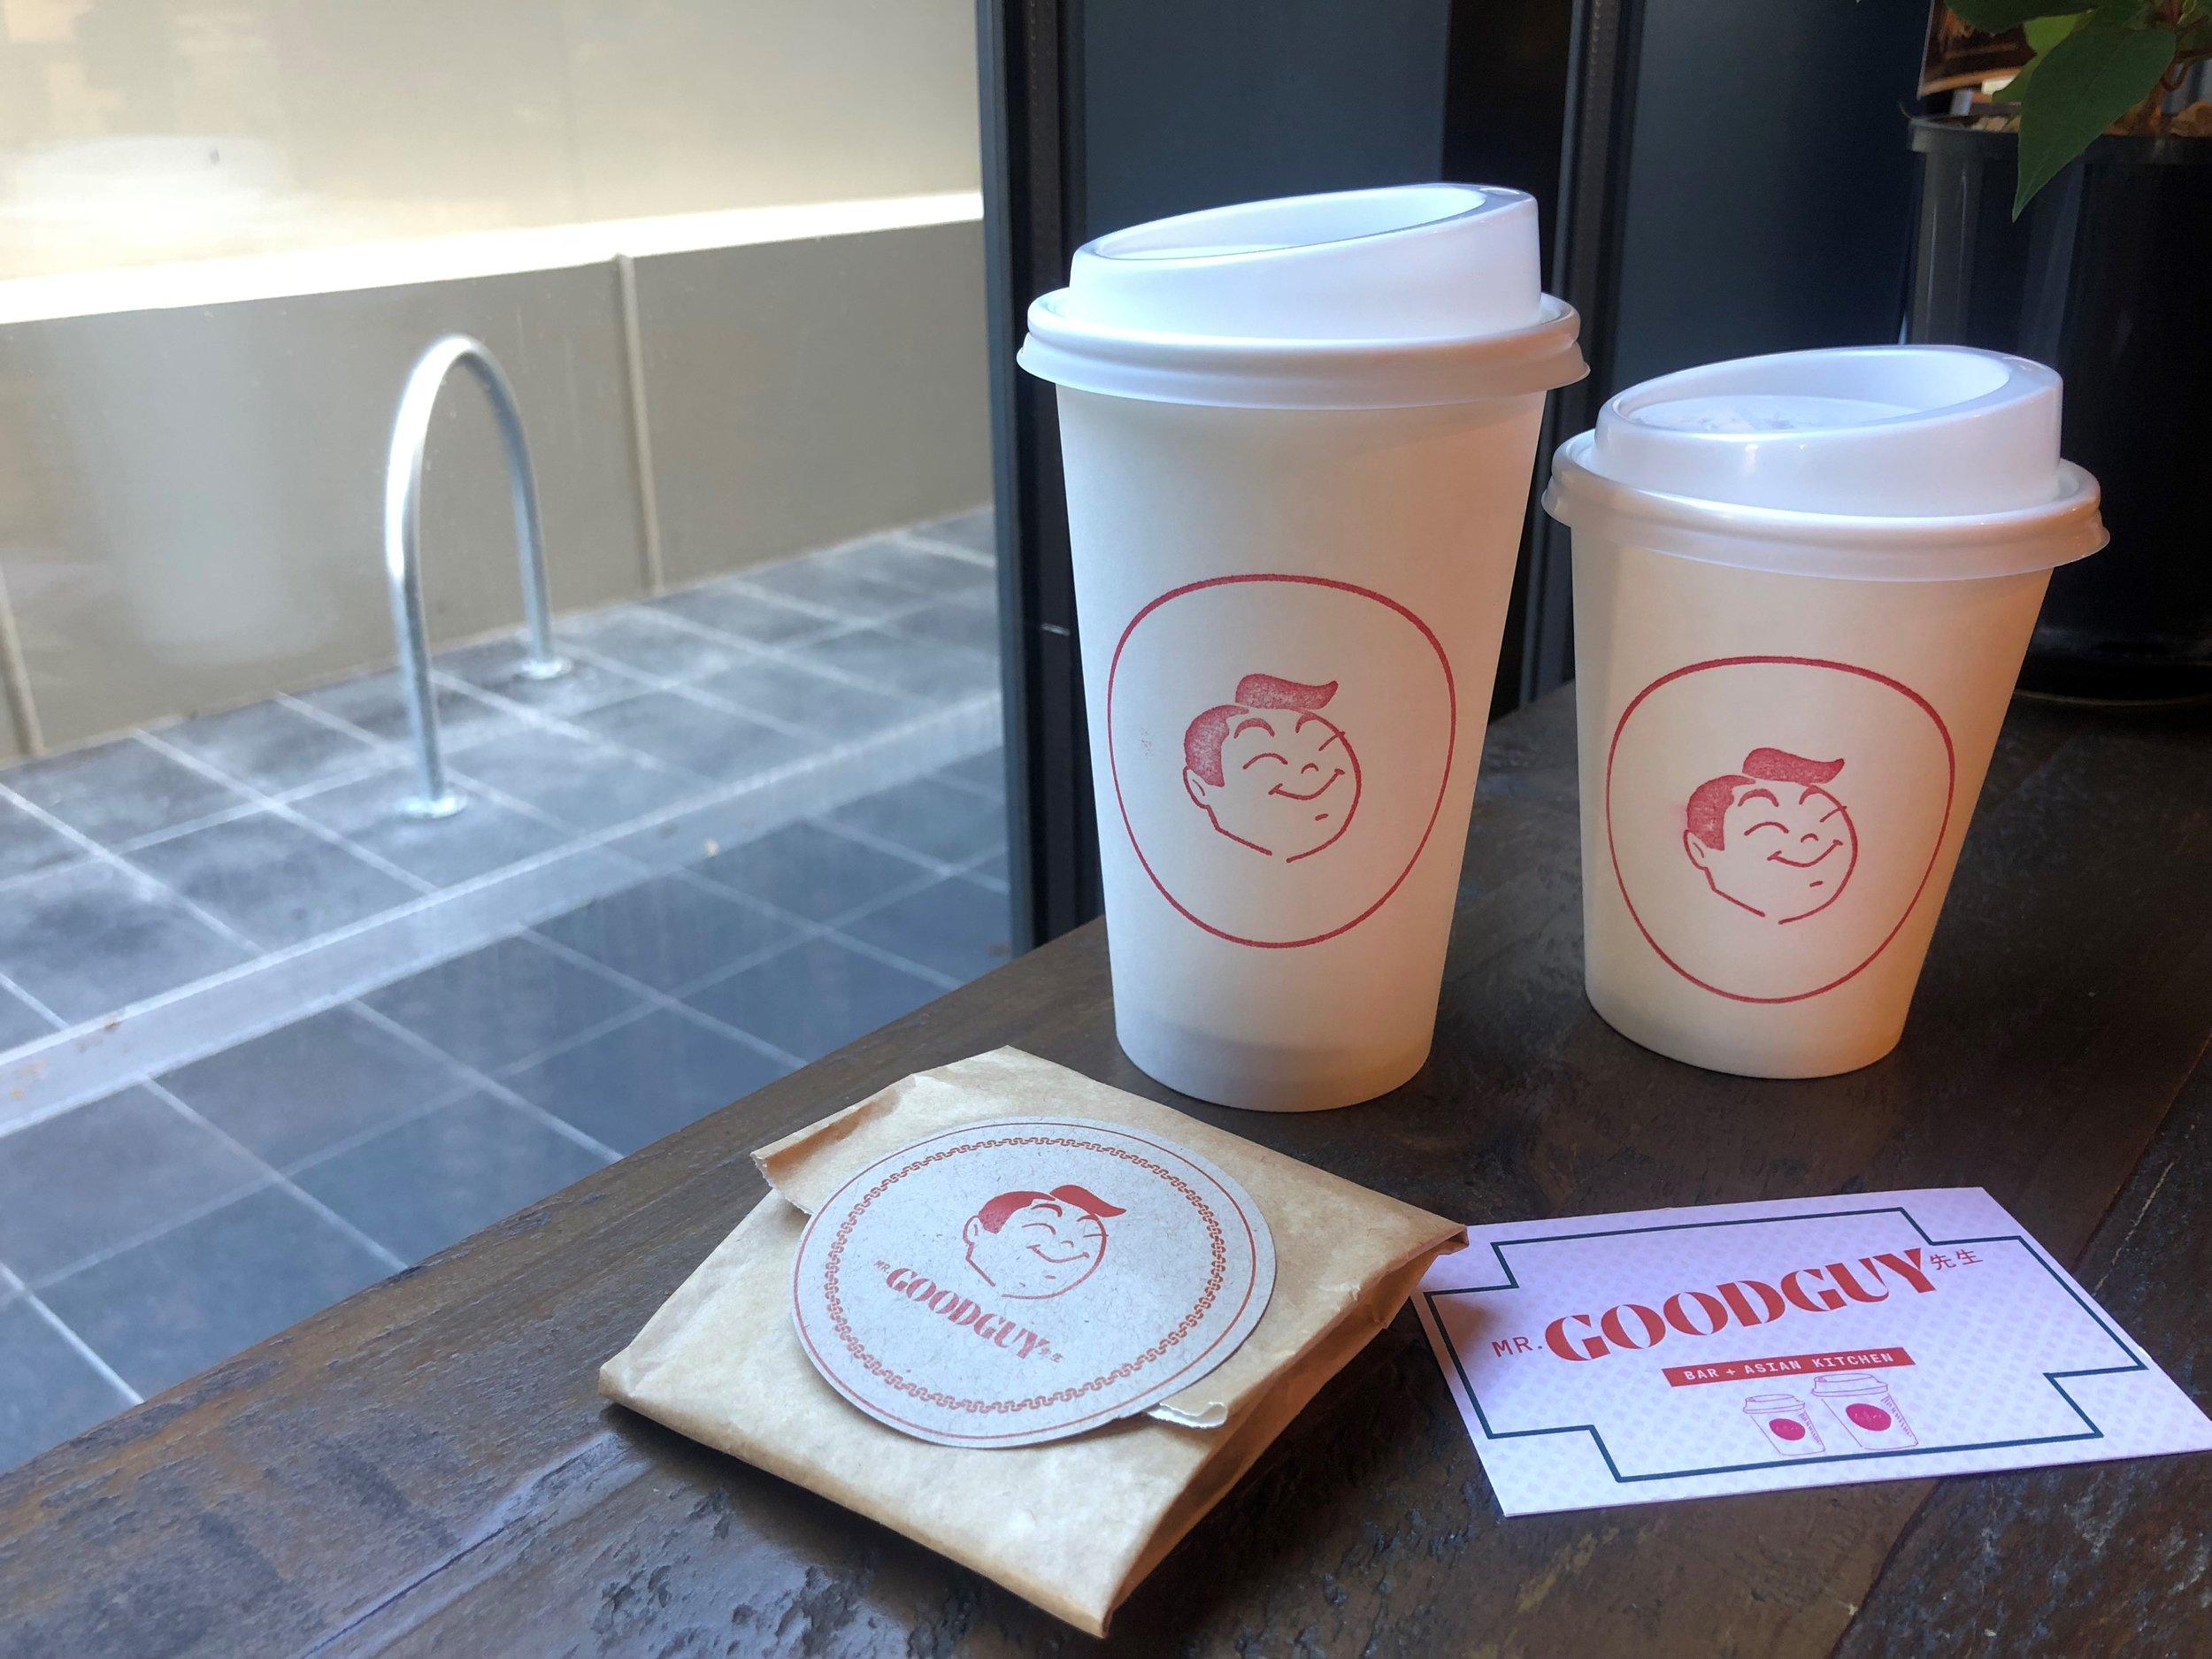 Mr Good Guy - Hobart Restaurant- coffee